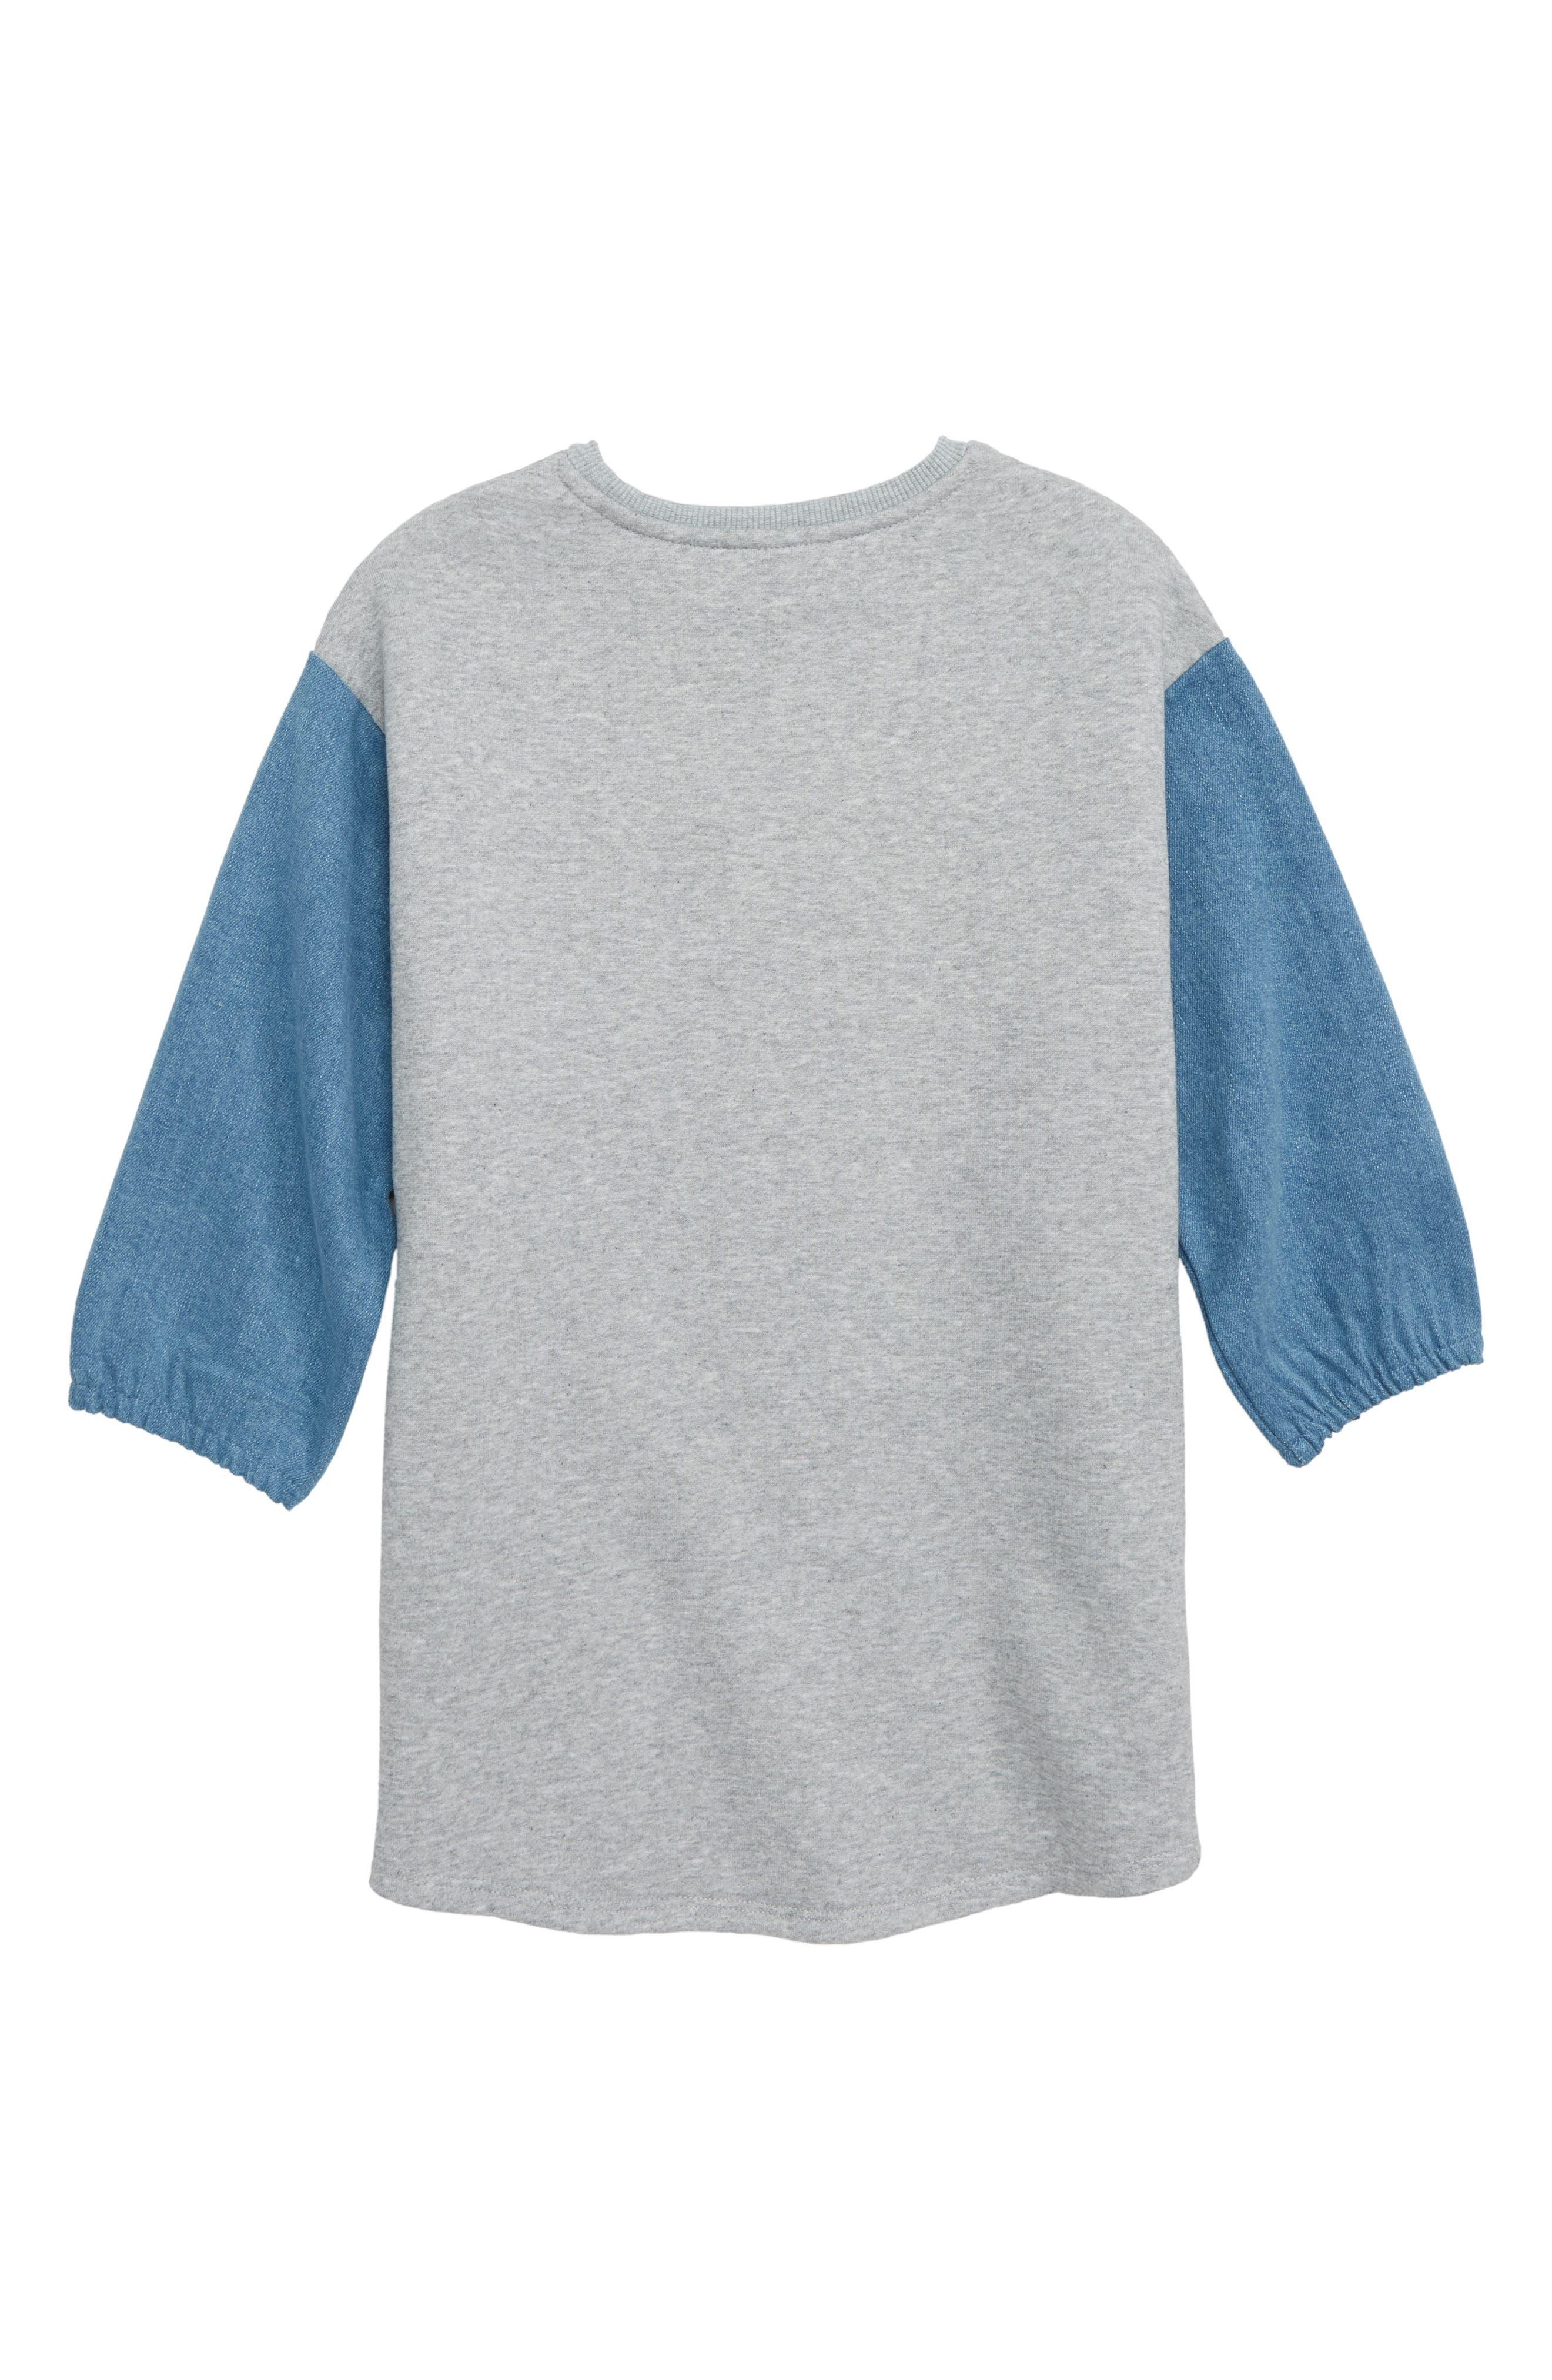 Denim Puff Sleeve Sweatshirt Dress,                             Alternate thumbnail 2, color,                             030